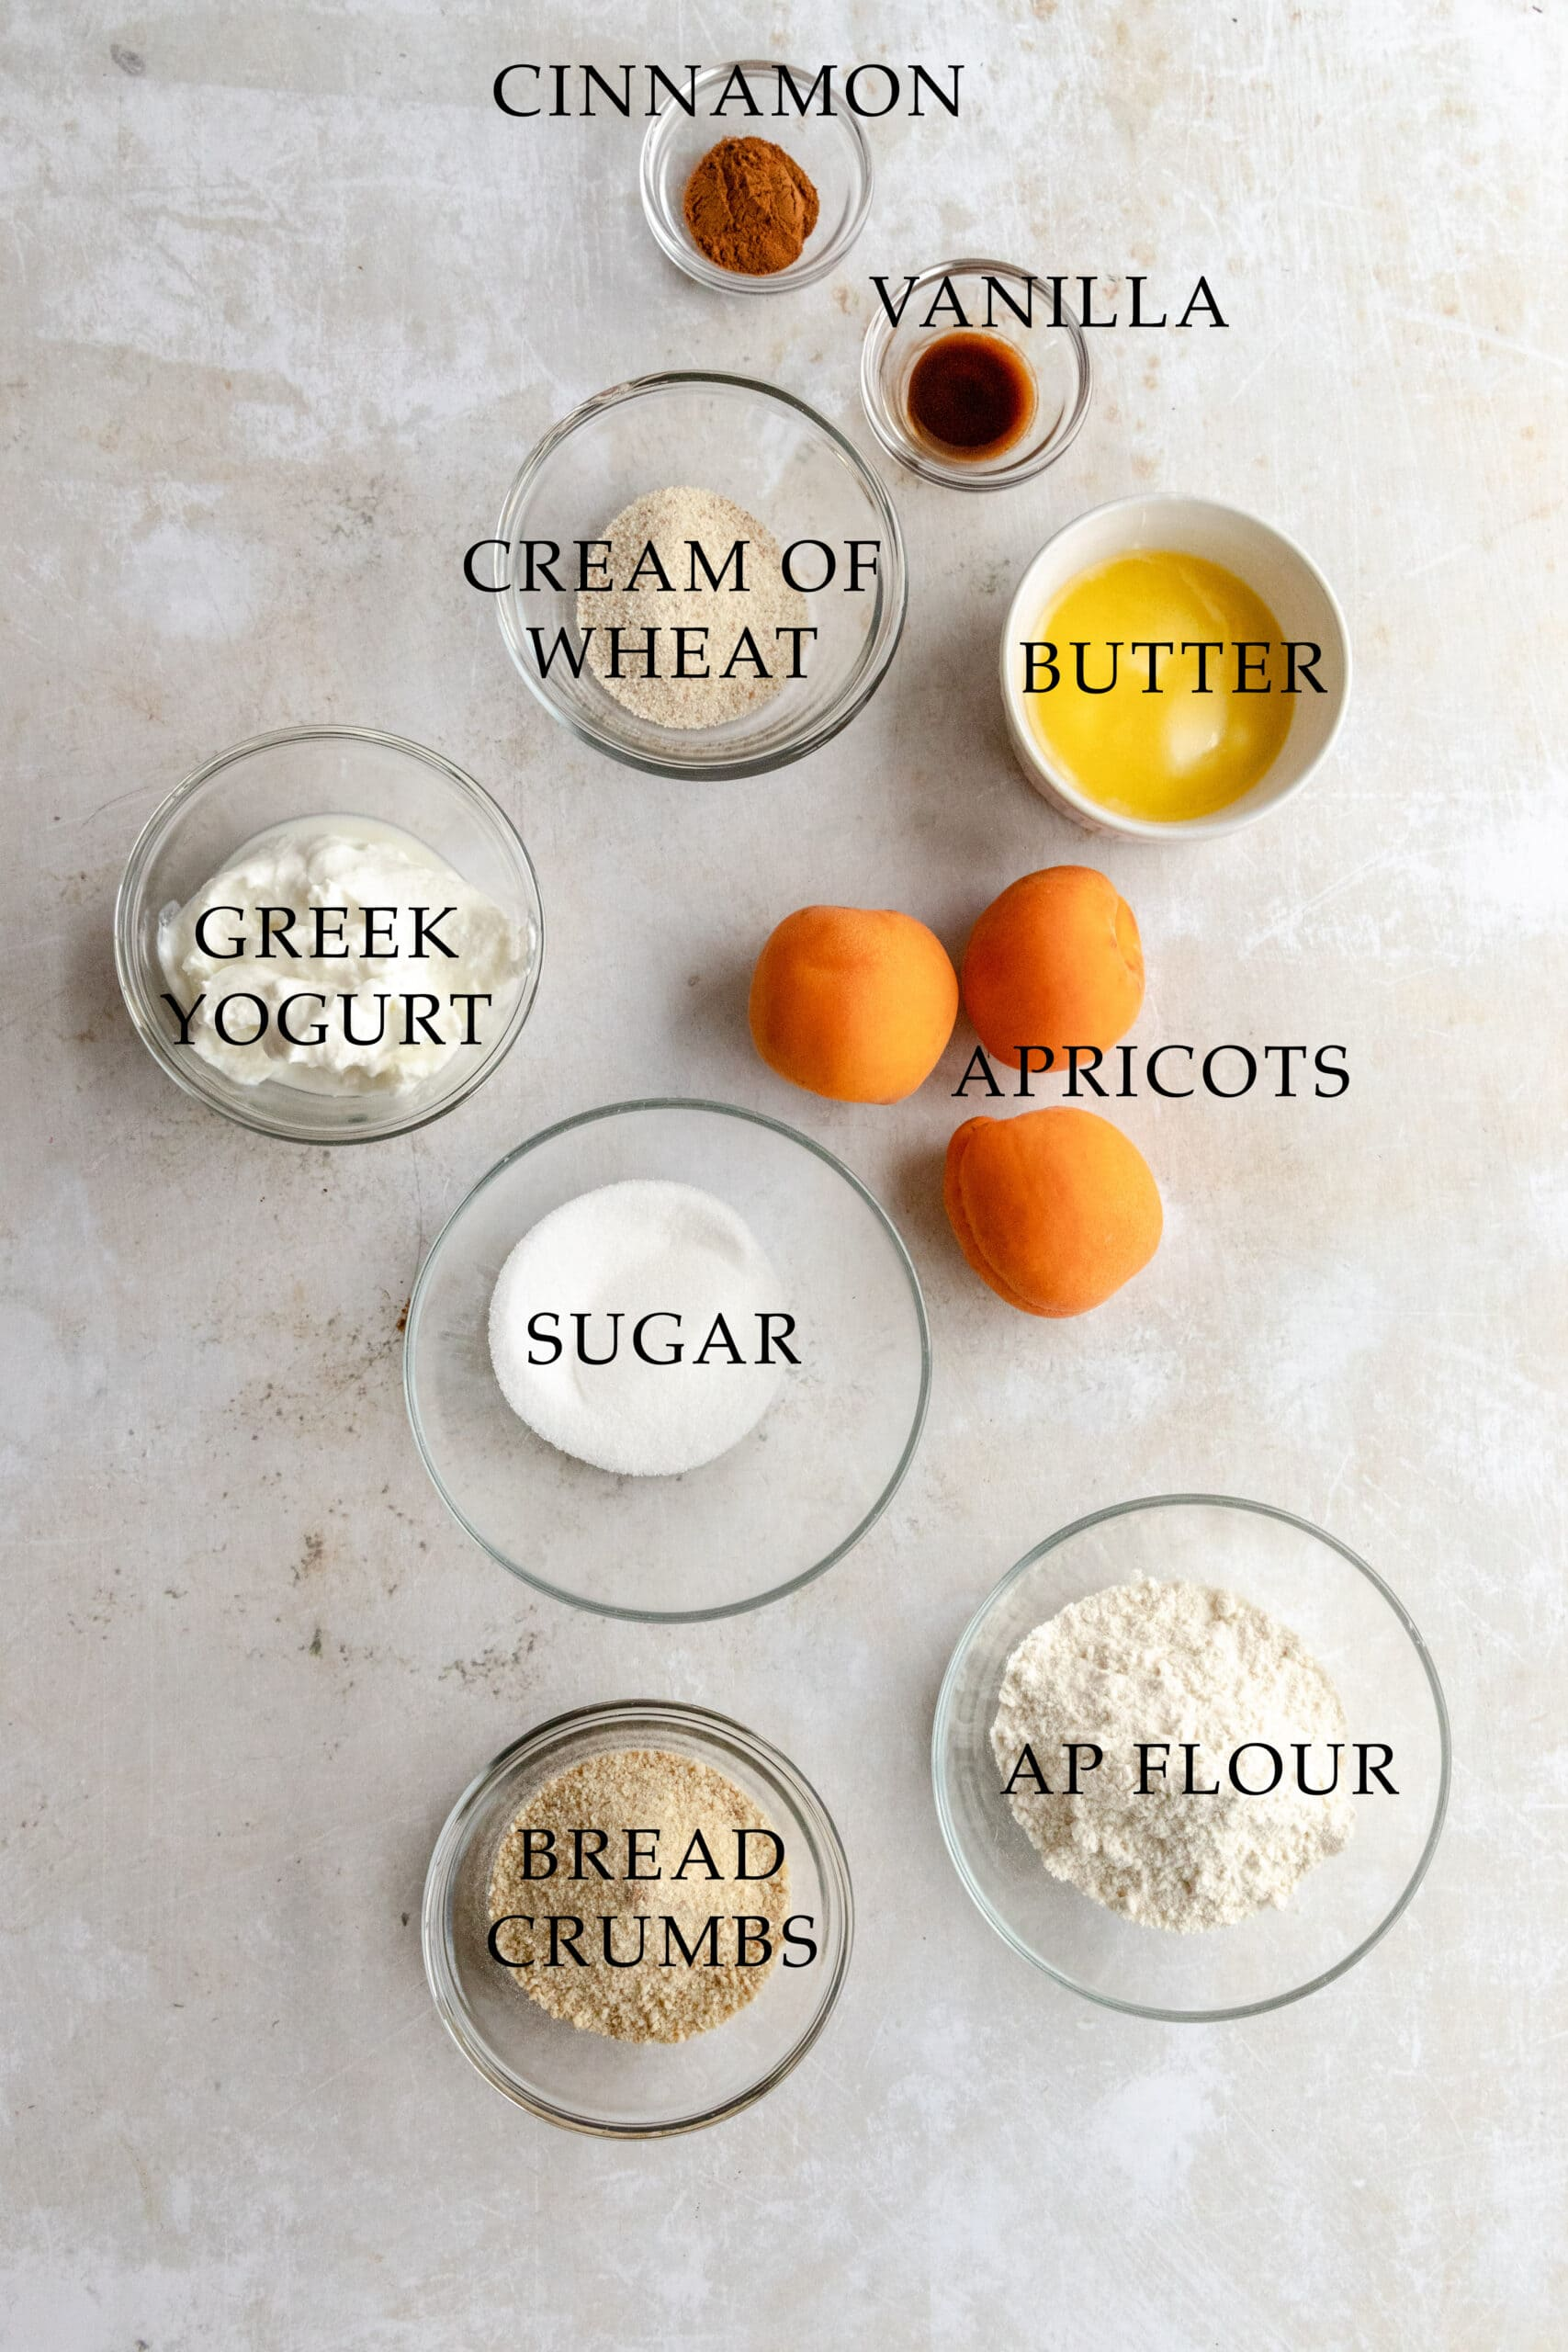 Ingredients needed for marillenknödel.